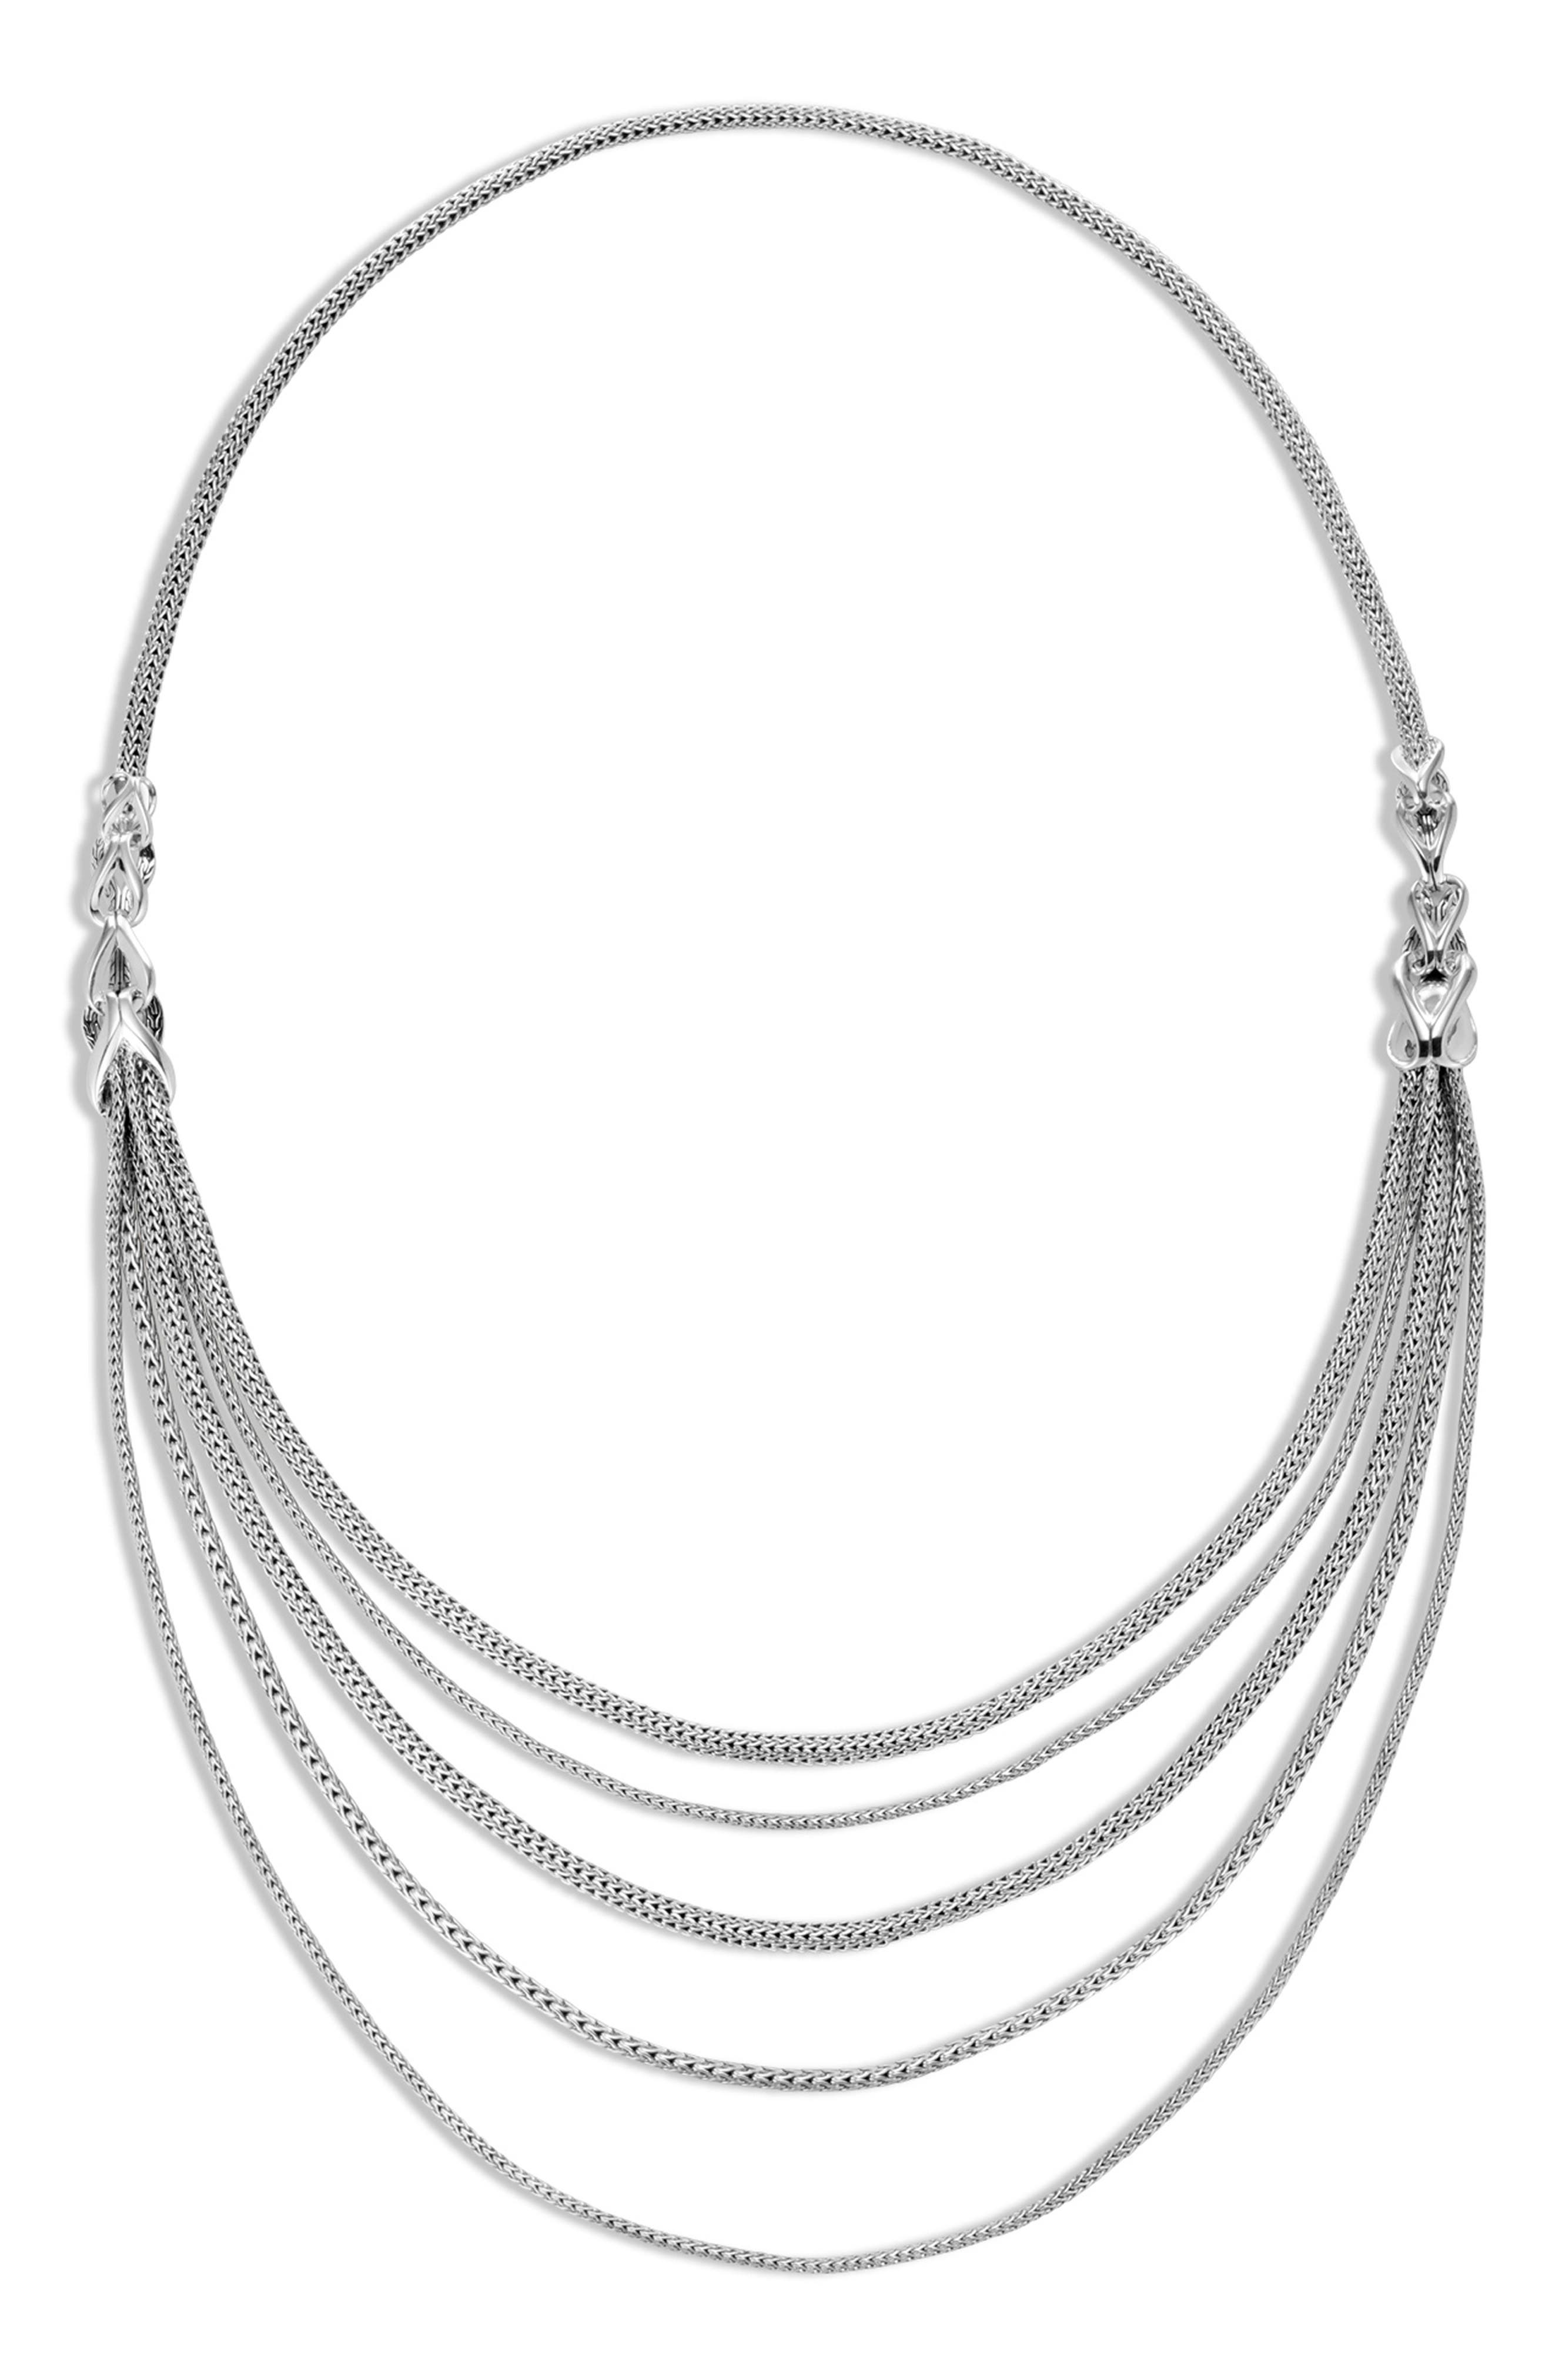 Asli Classic Chain Link Bib Necklace,                             Alternate thumbnail 4, color,                             SILVER